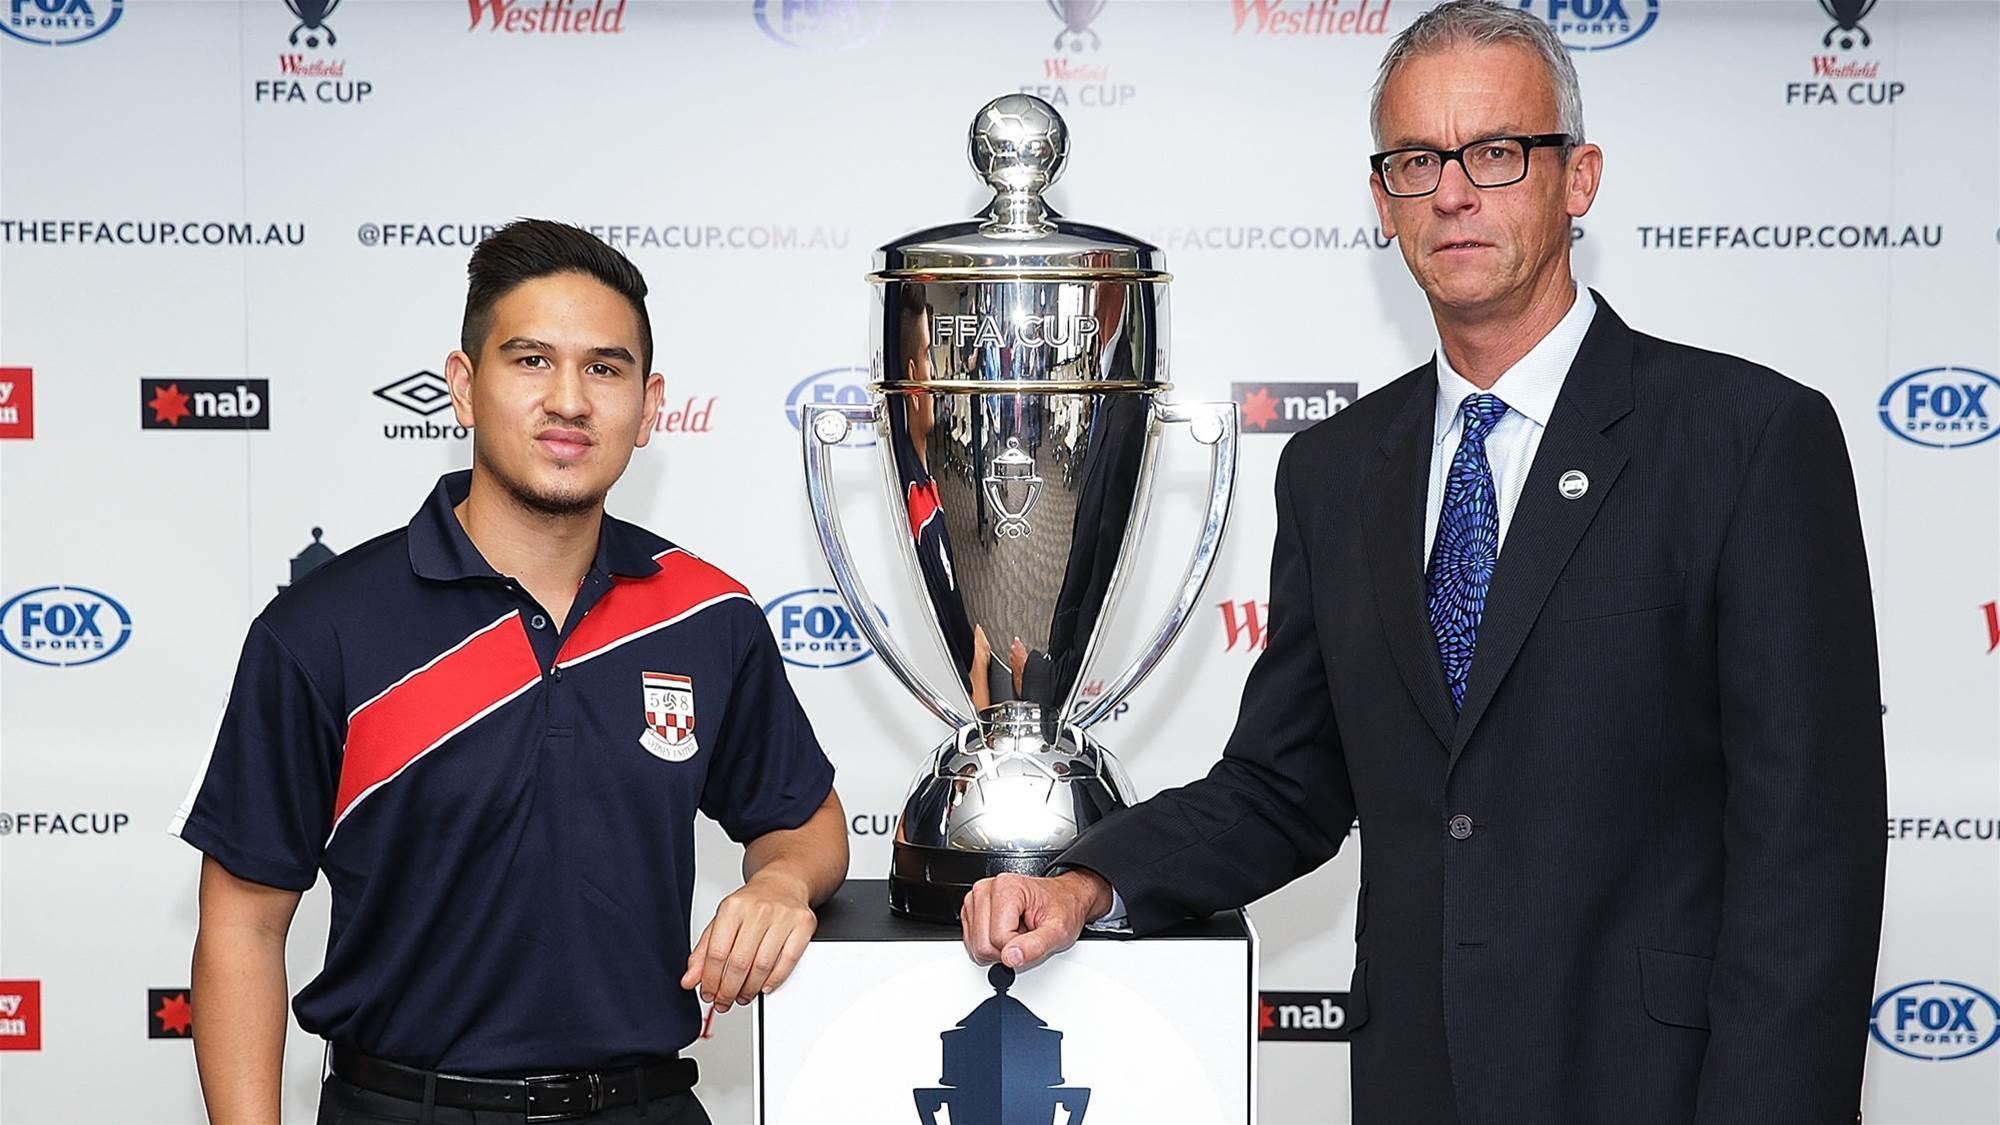 Kaz Patafta: My A-League Ambition